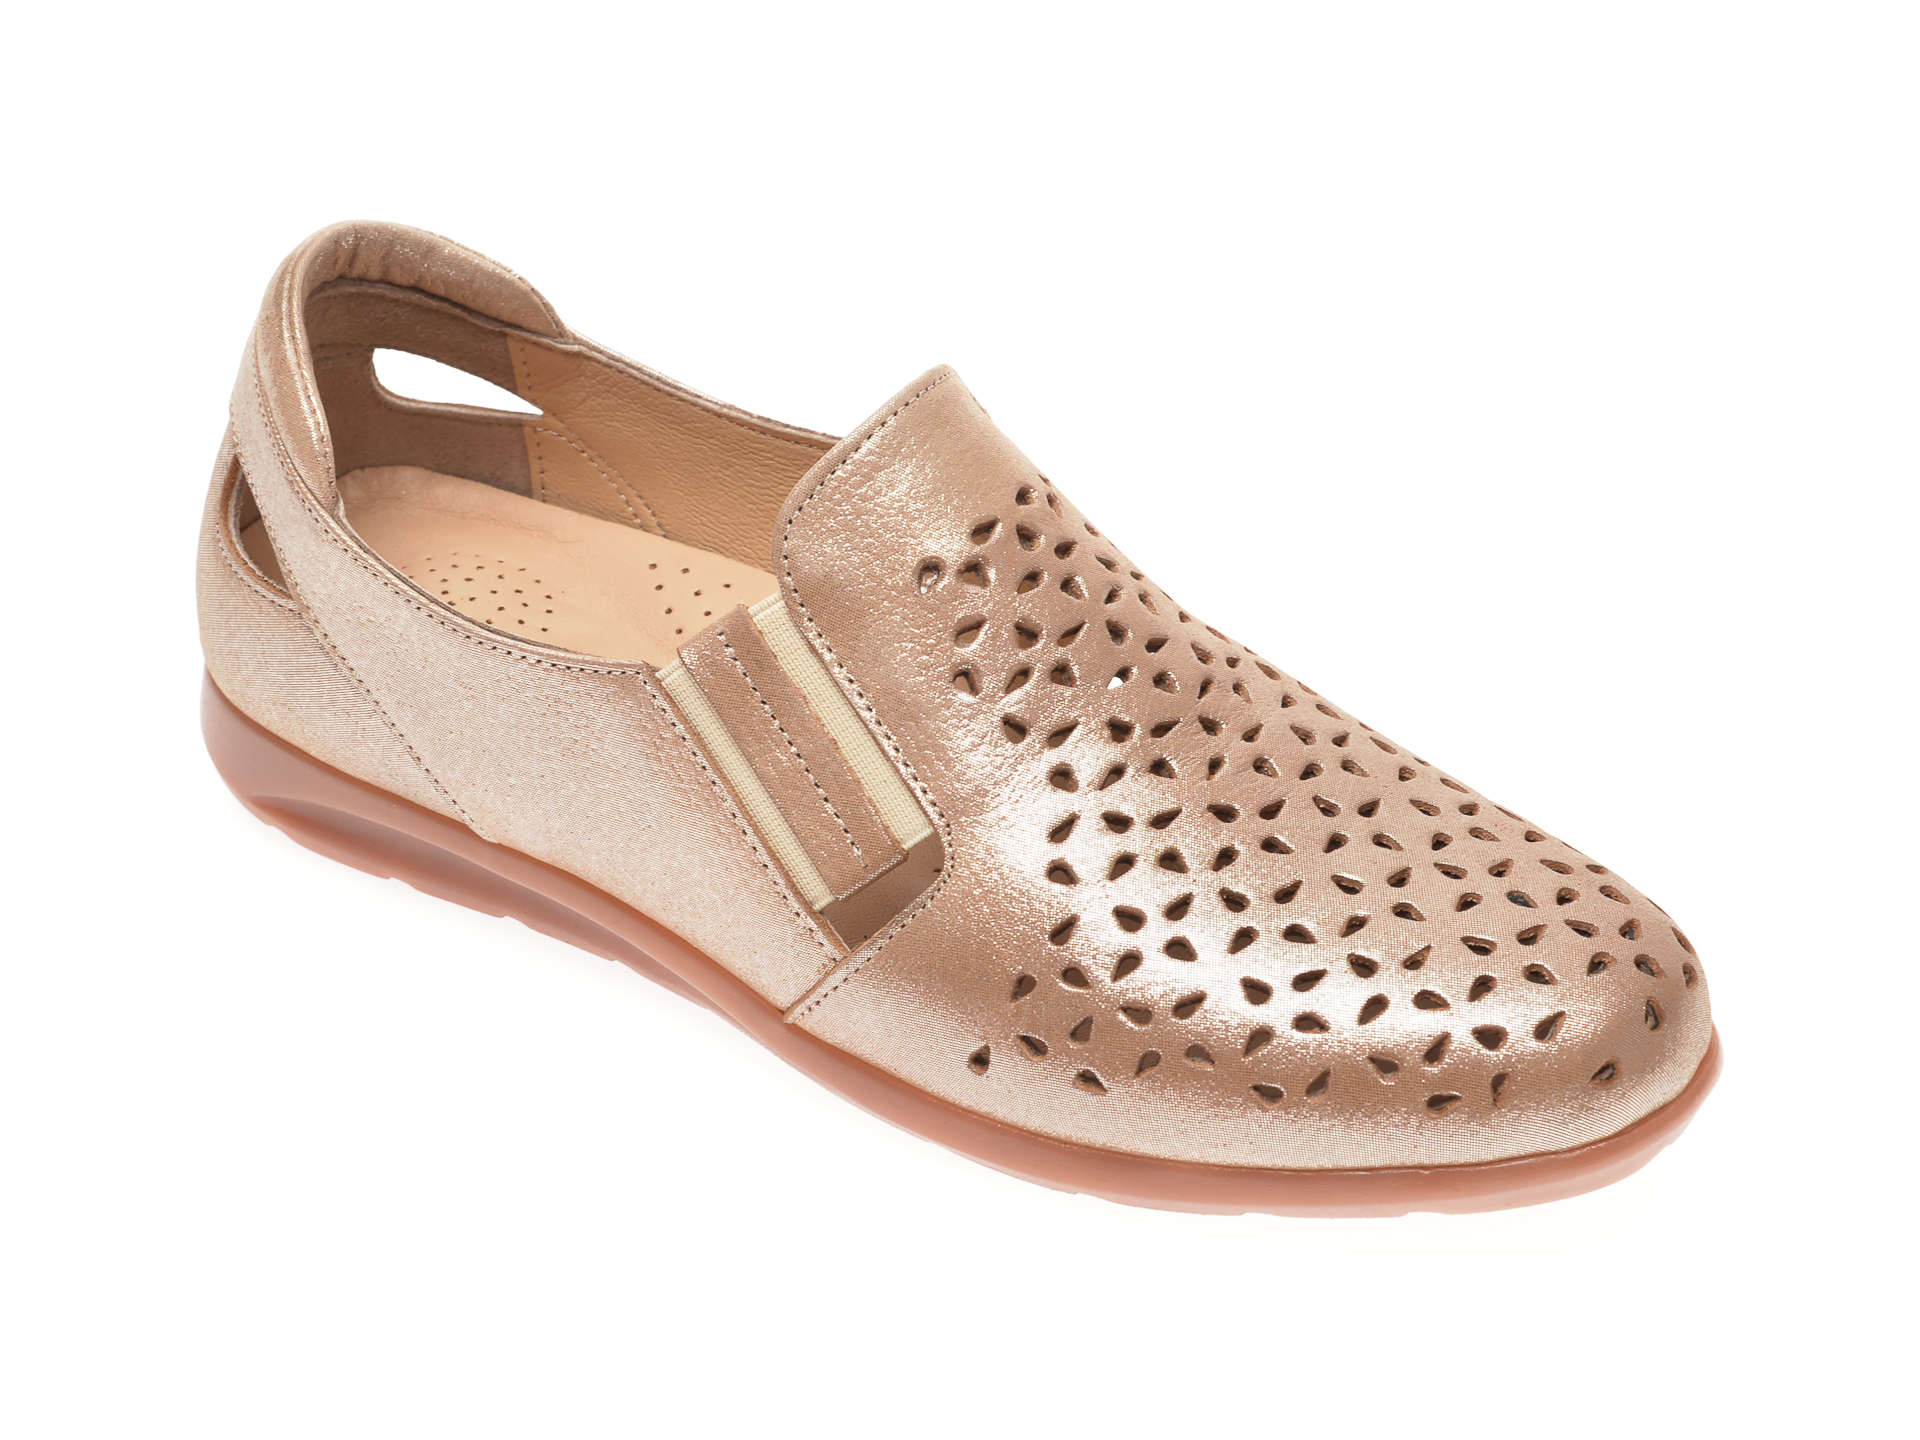 Pantofi PASS COLLECTION aurii, 14152, din piele naturala imagine